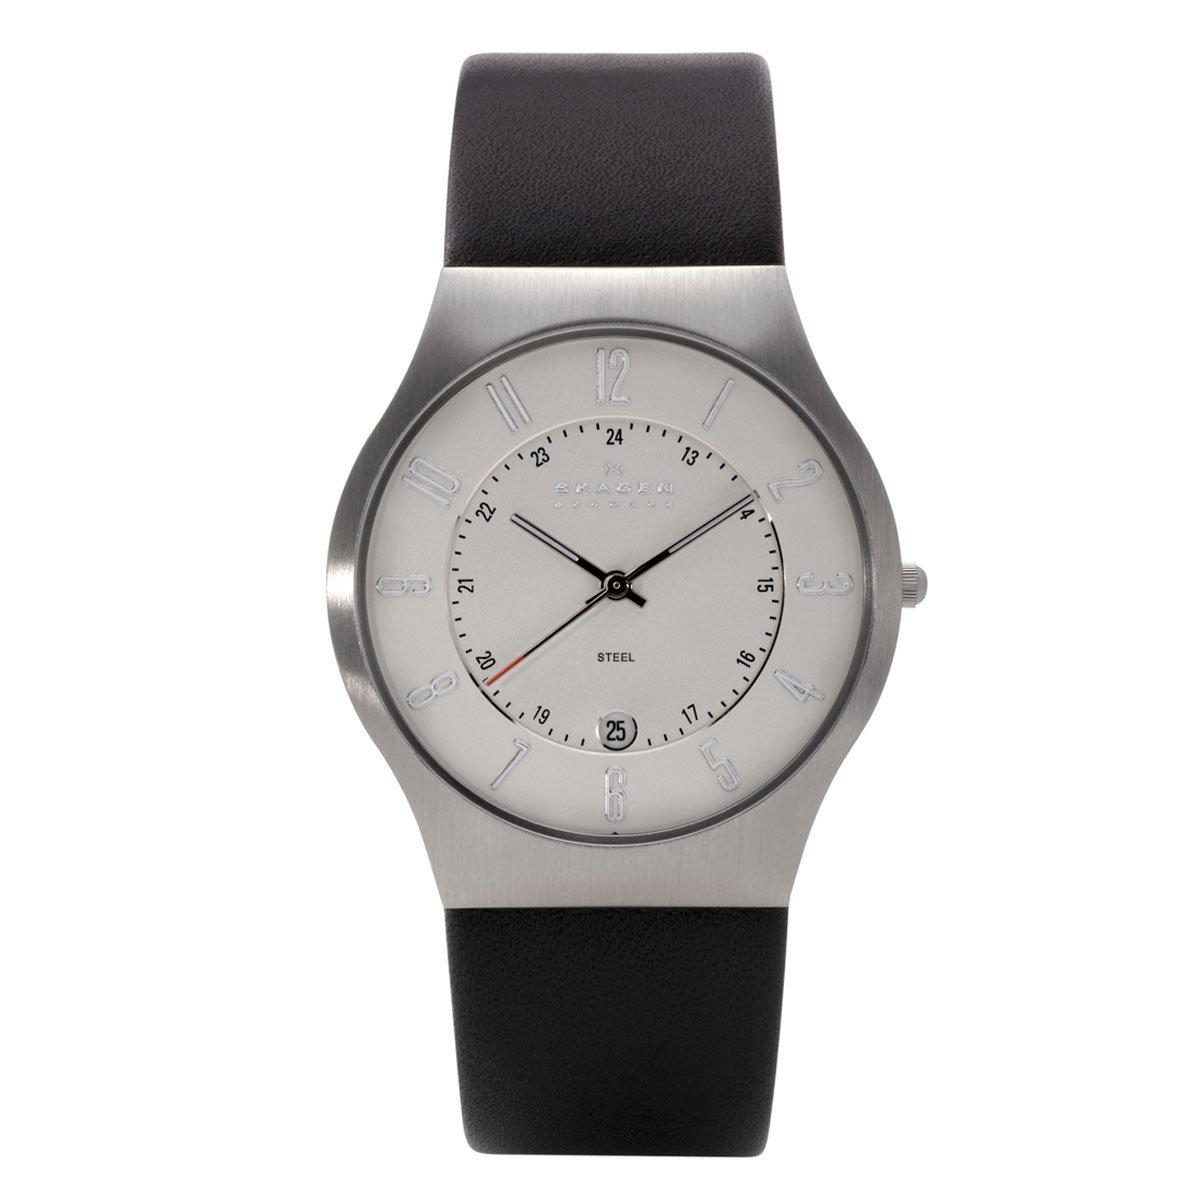 Herren-Armbanduhr Analog Quarz Leder 233XXLSLCB